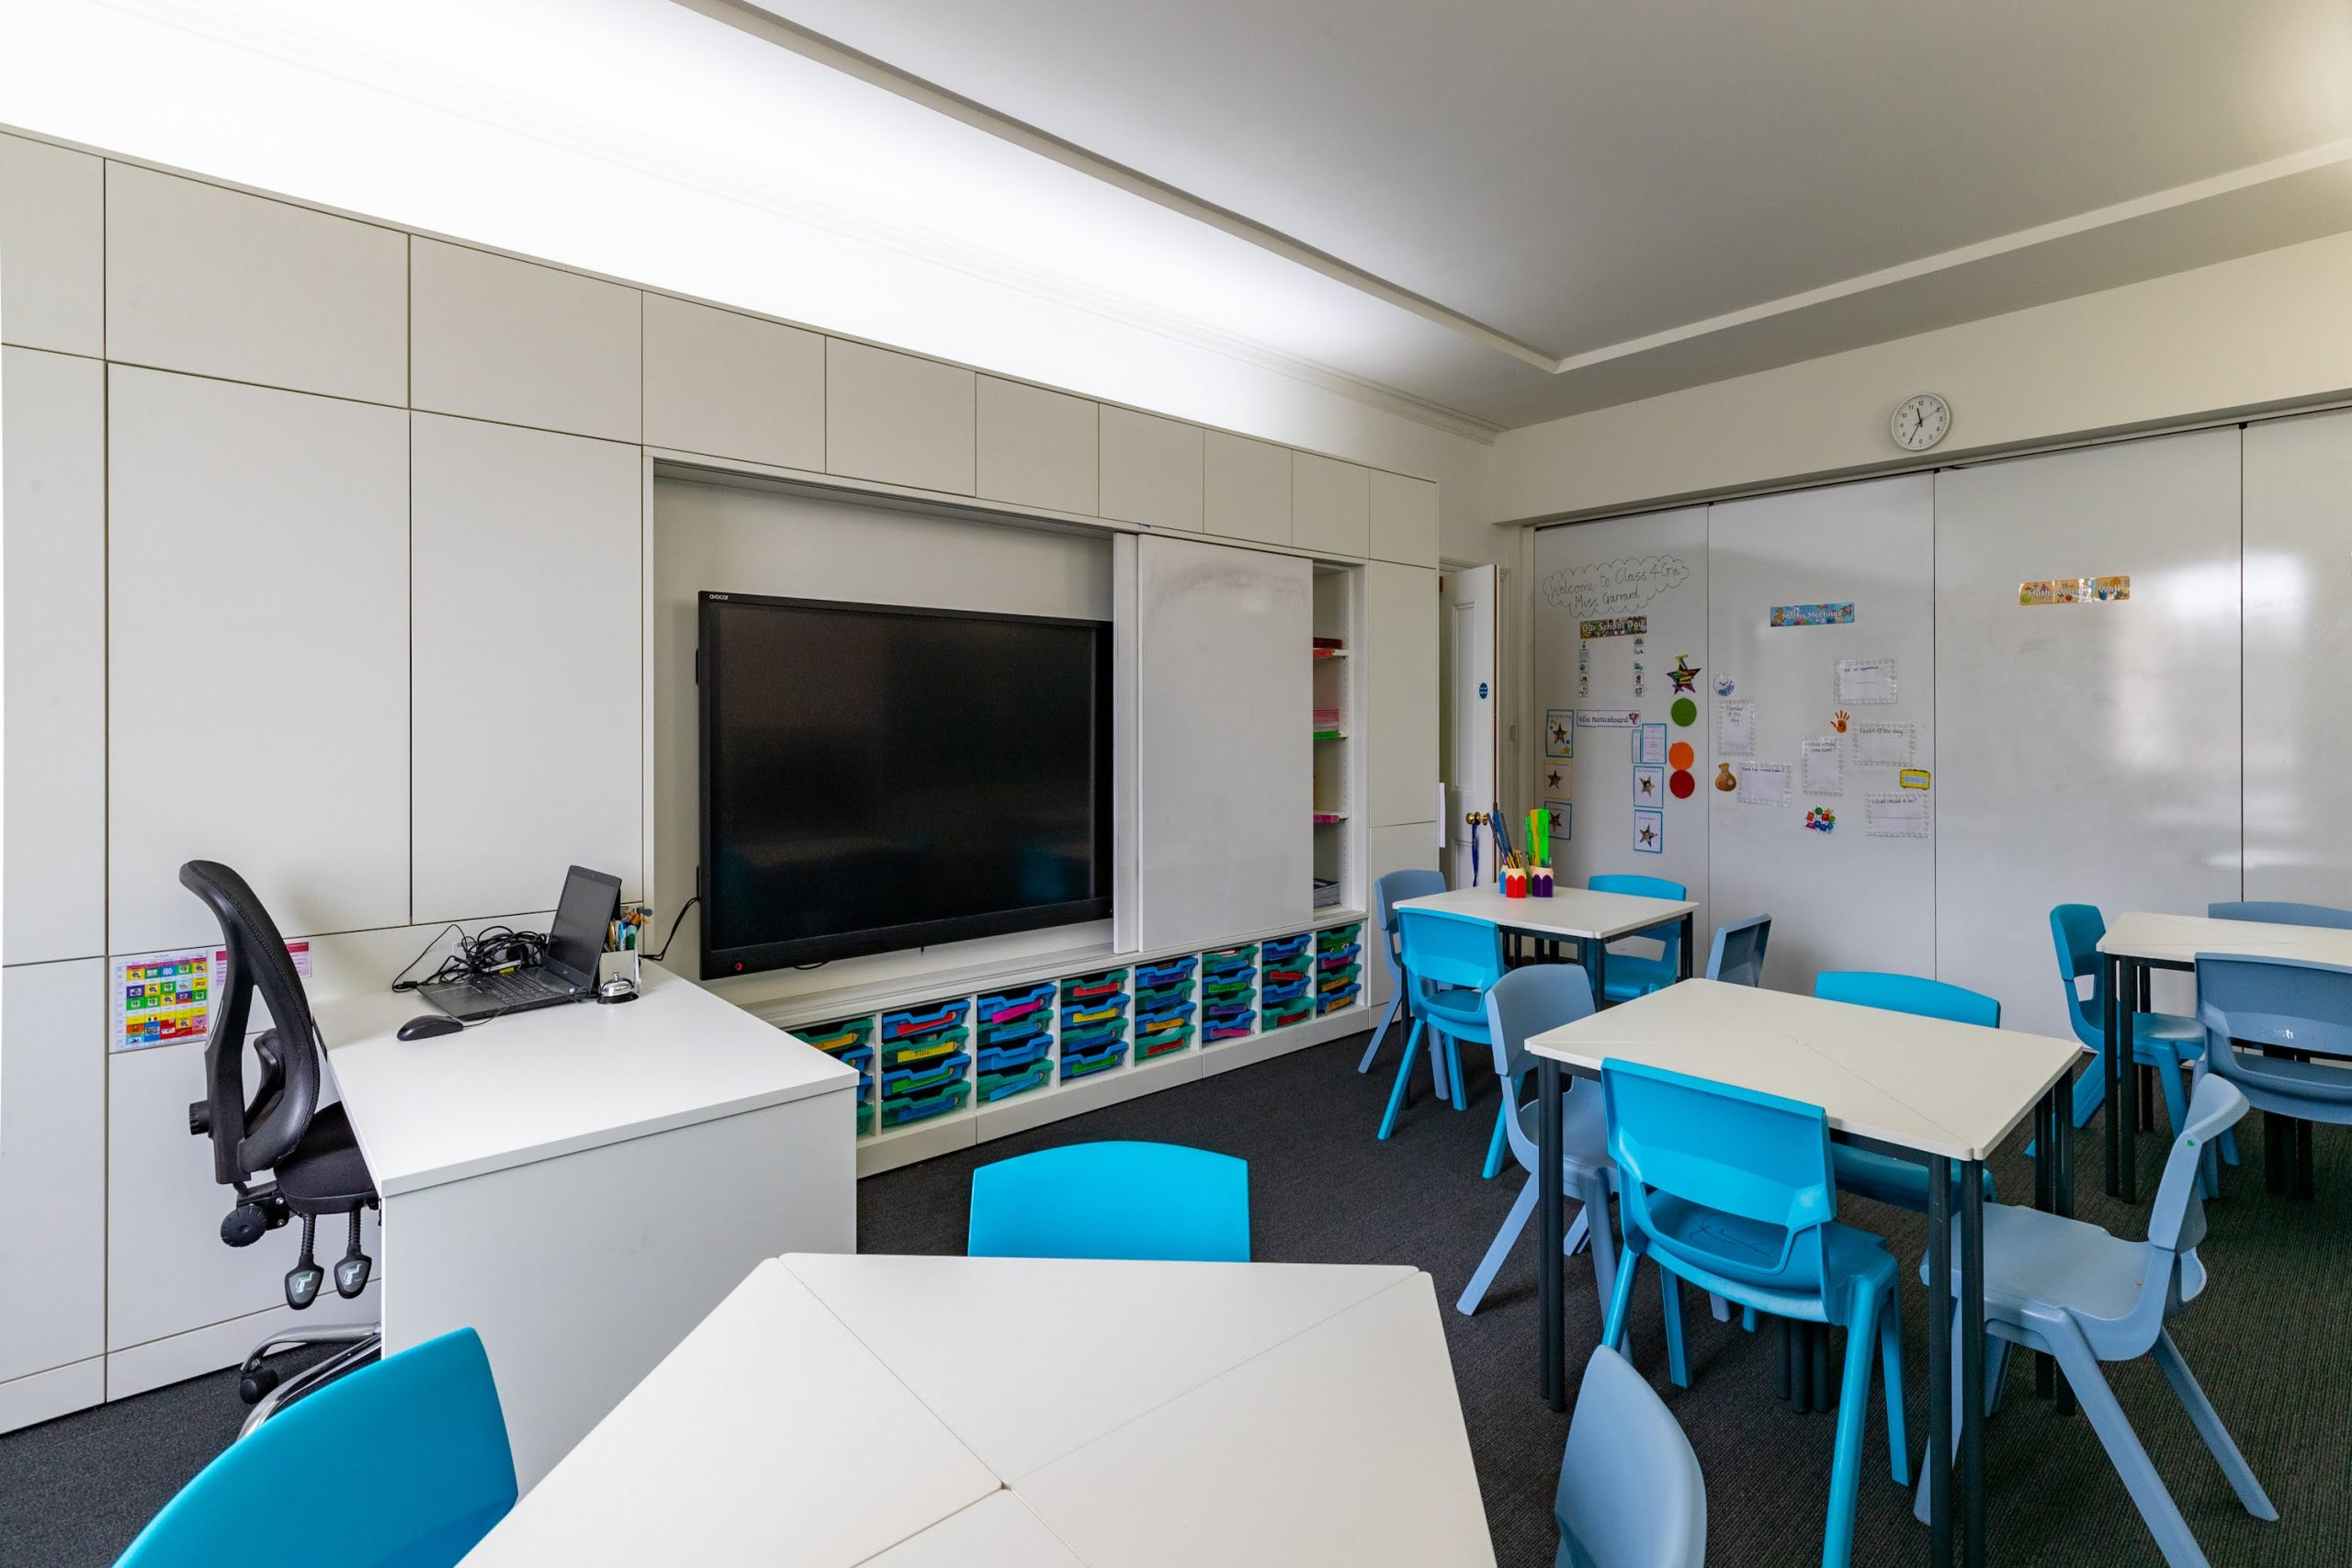 BrookhouseUk Eaton Square - Teacher wall classroom